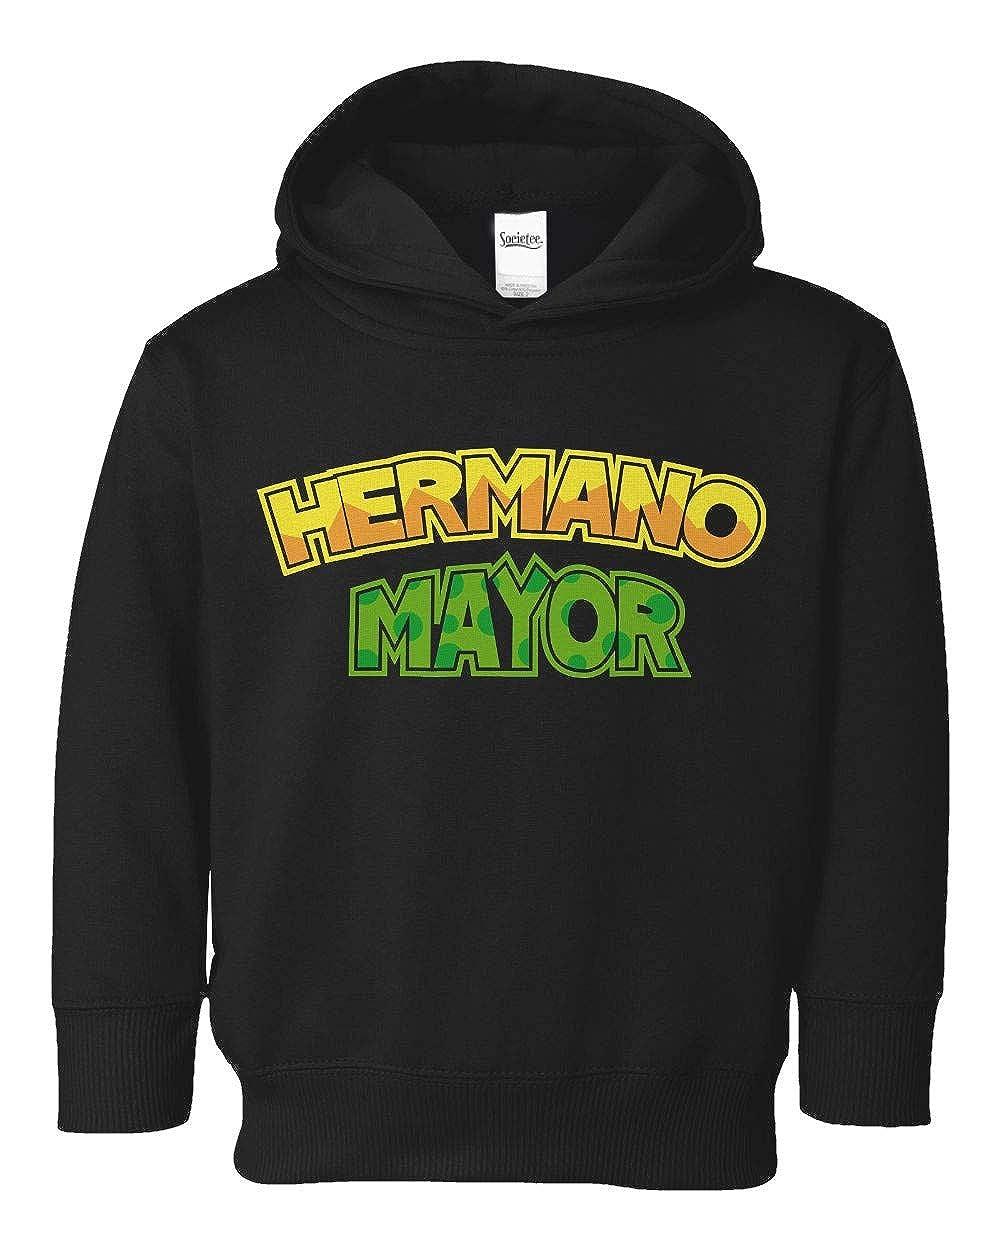 Societee Hermano Mayor Girls Boys Toddler Hooded Sweatshirt